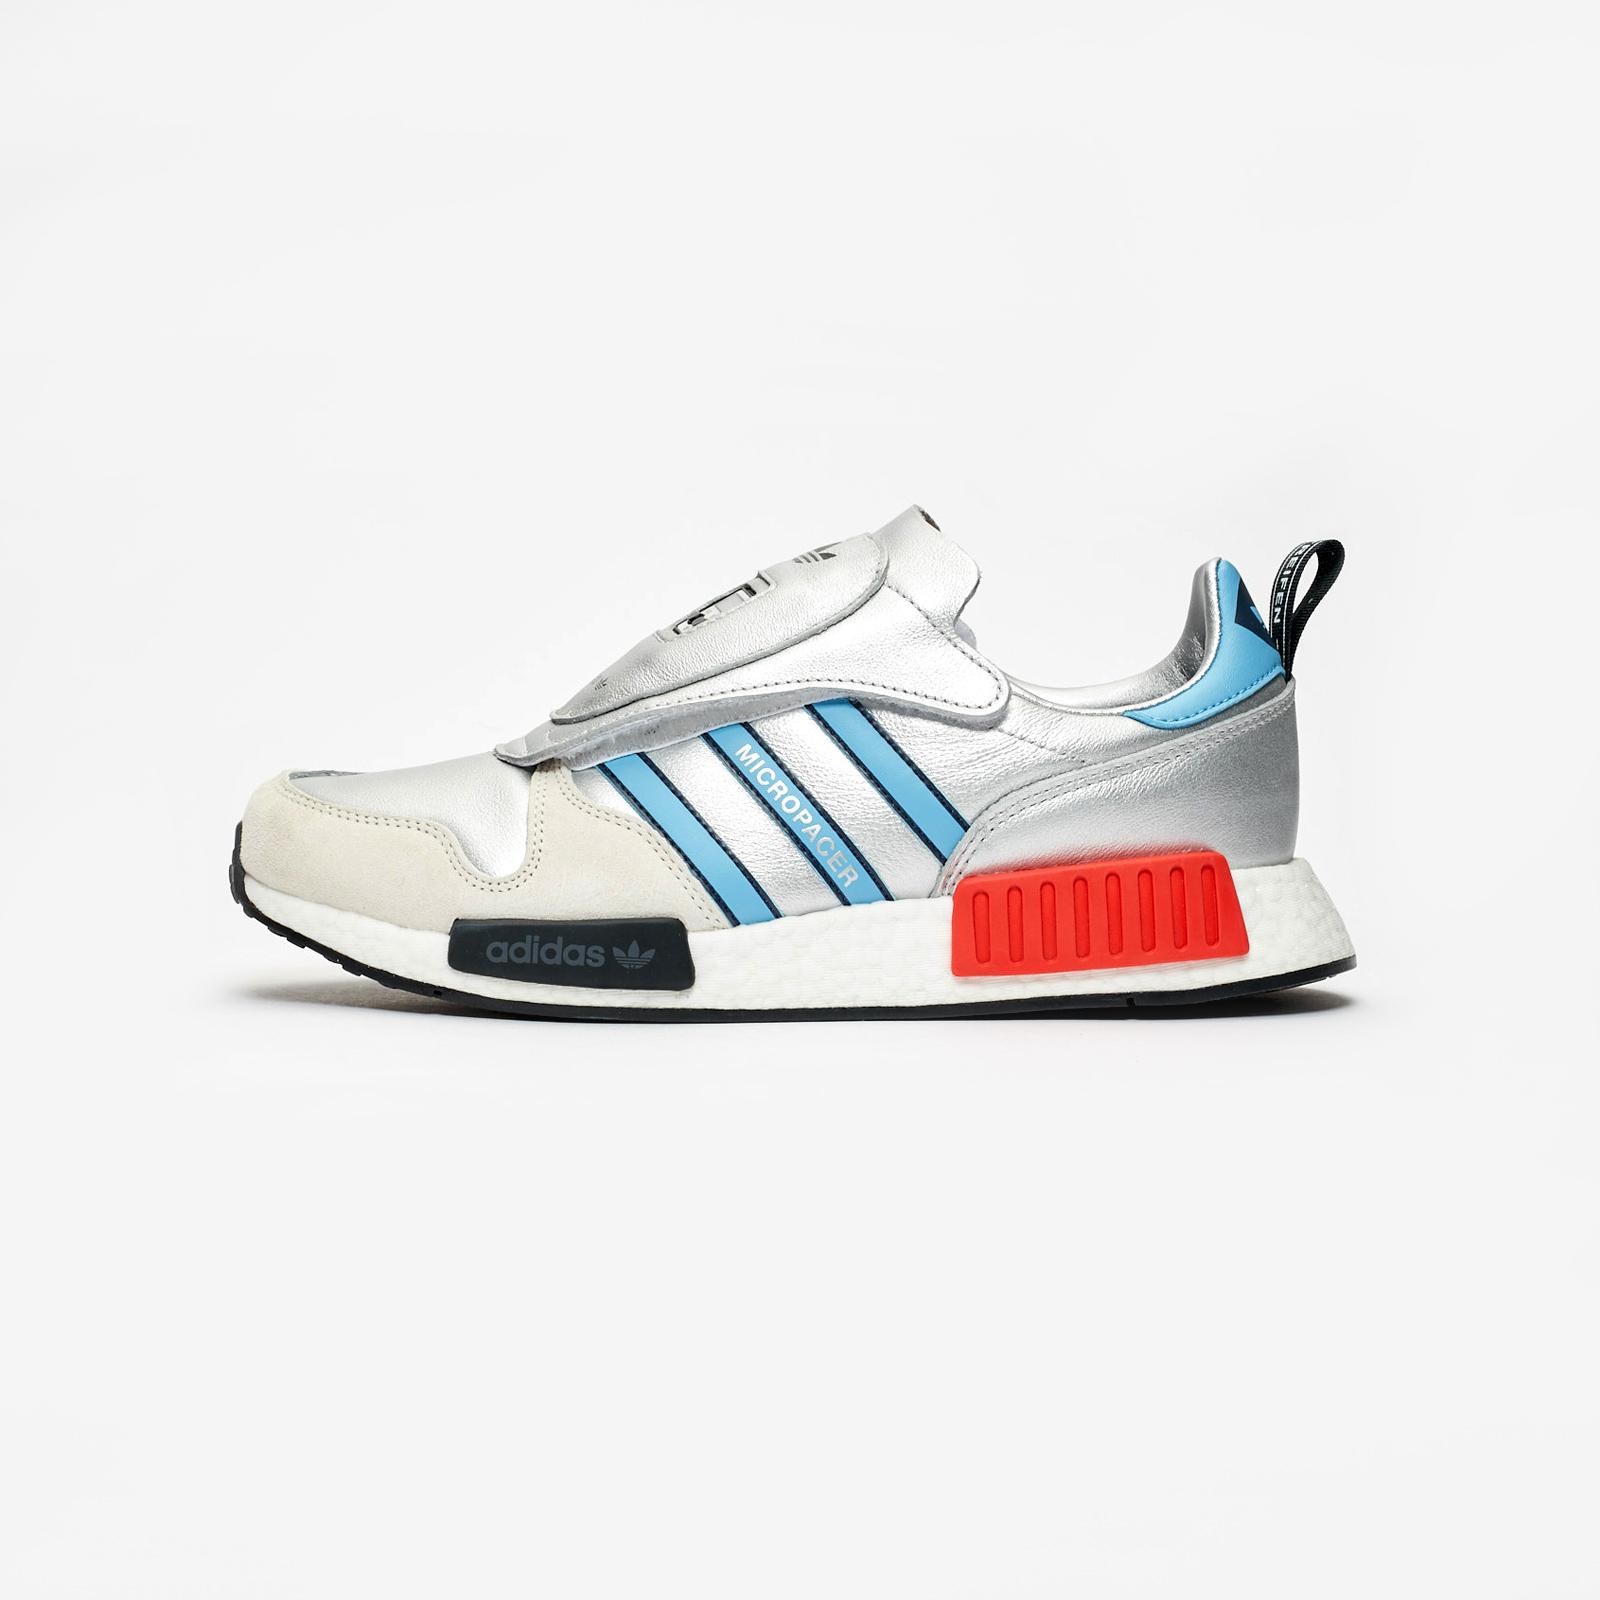 778e0356a adidas Micropacer x R1 - G26778 - Sneakersnstuff